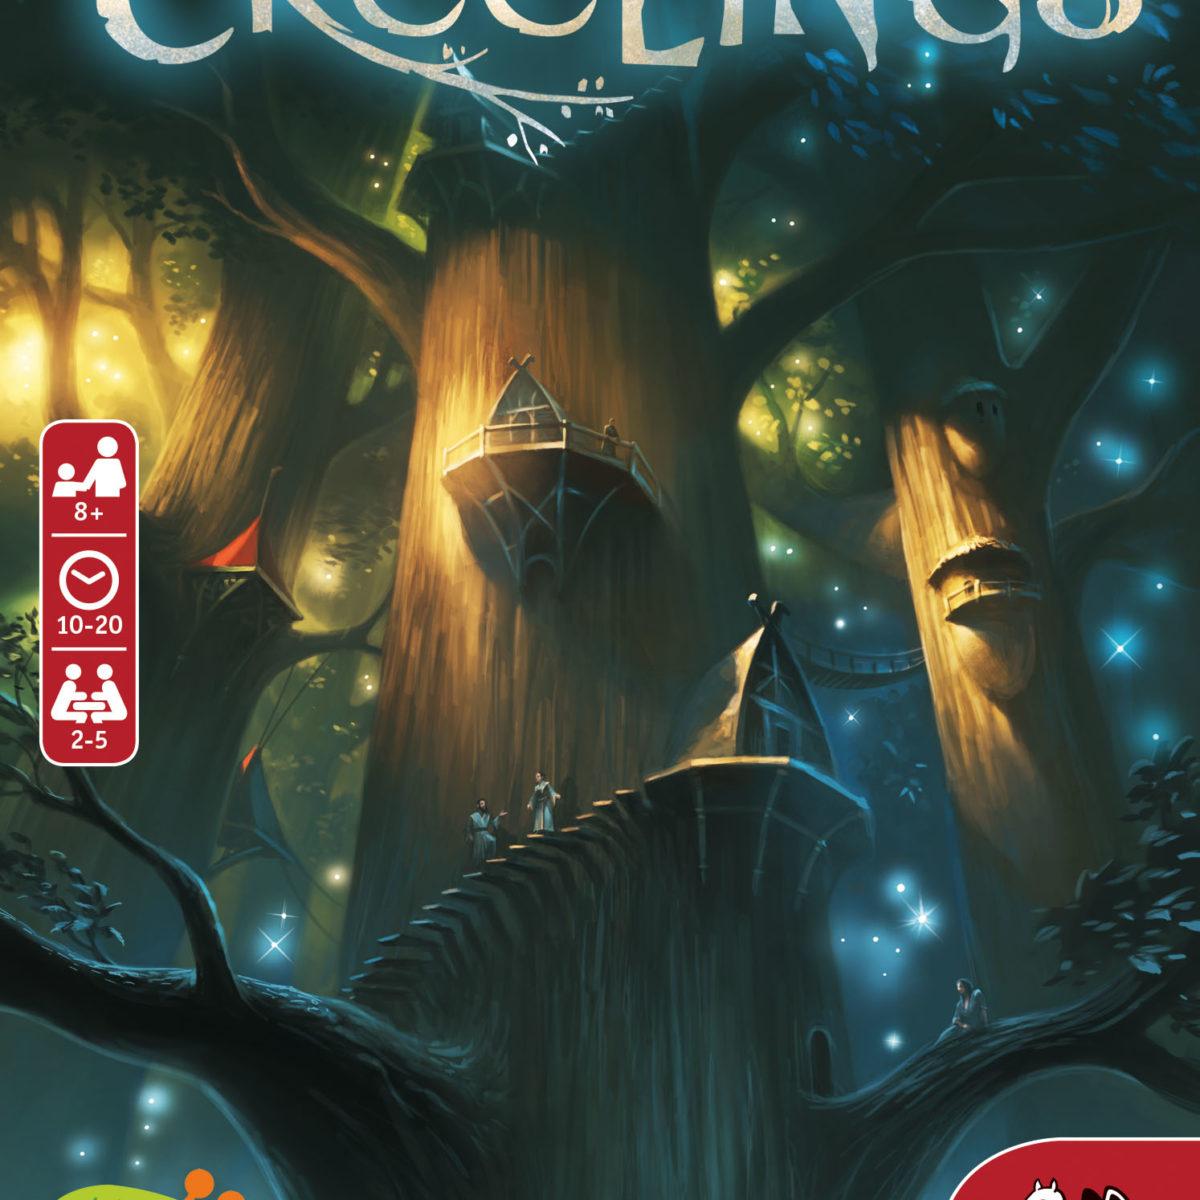 4250231727054_Treelings_Cover_RGB